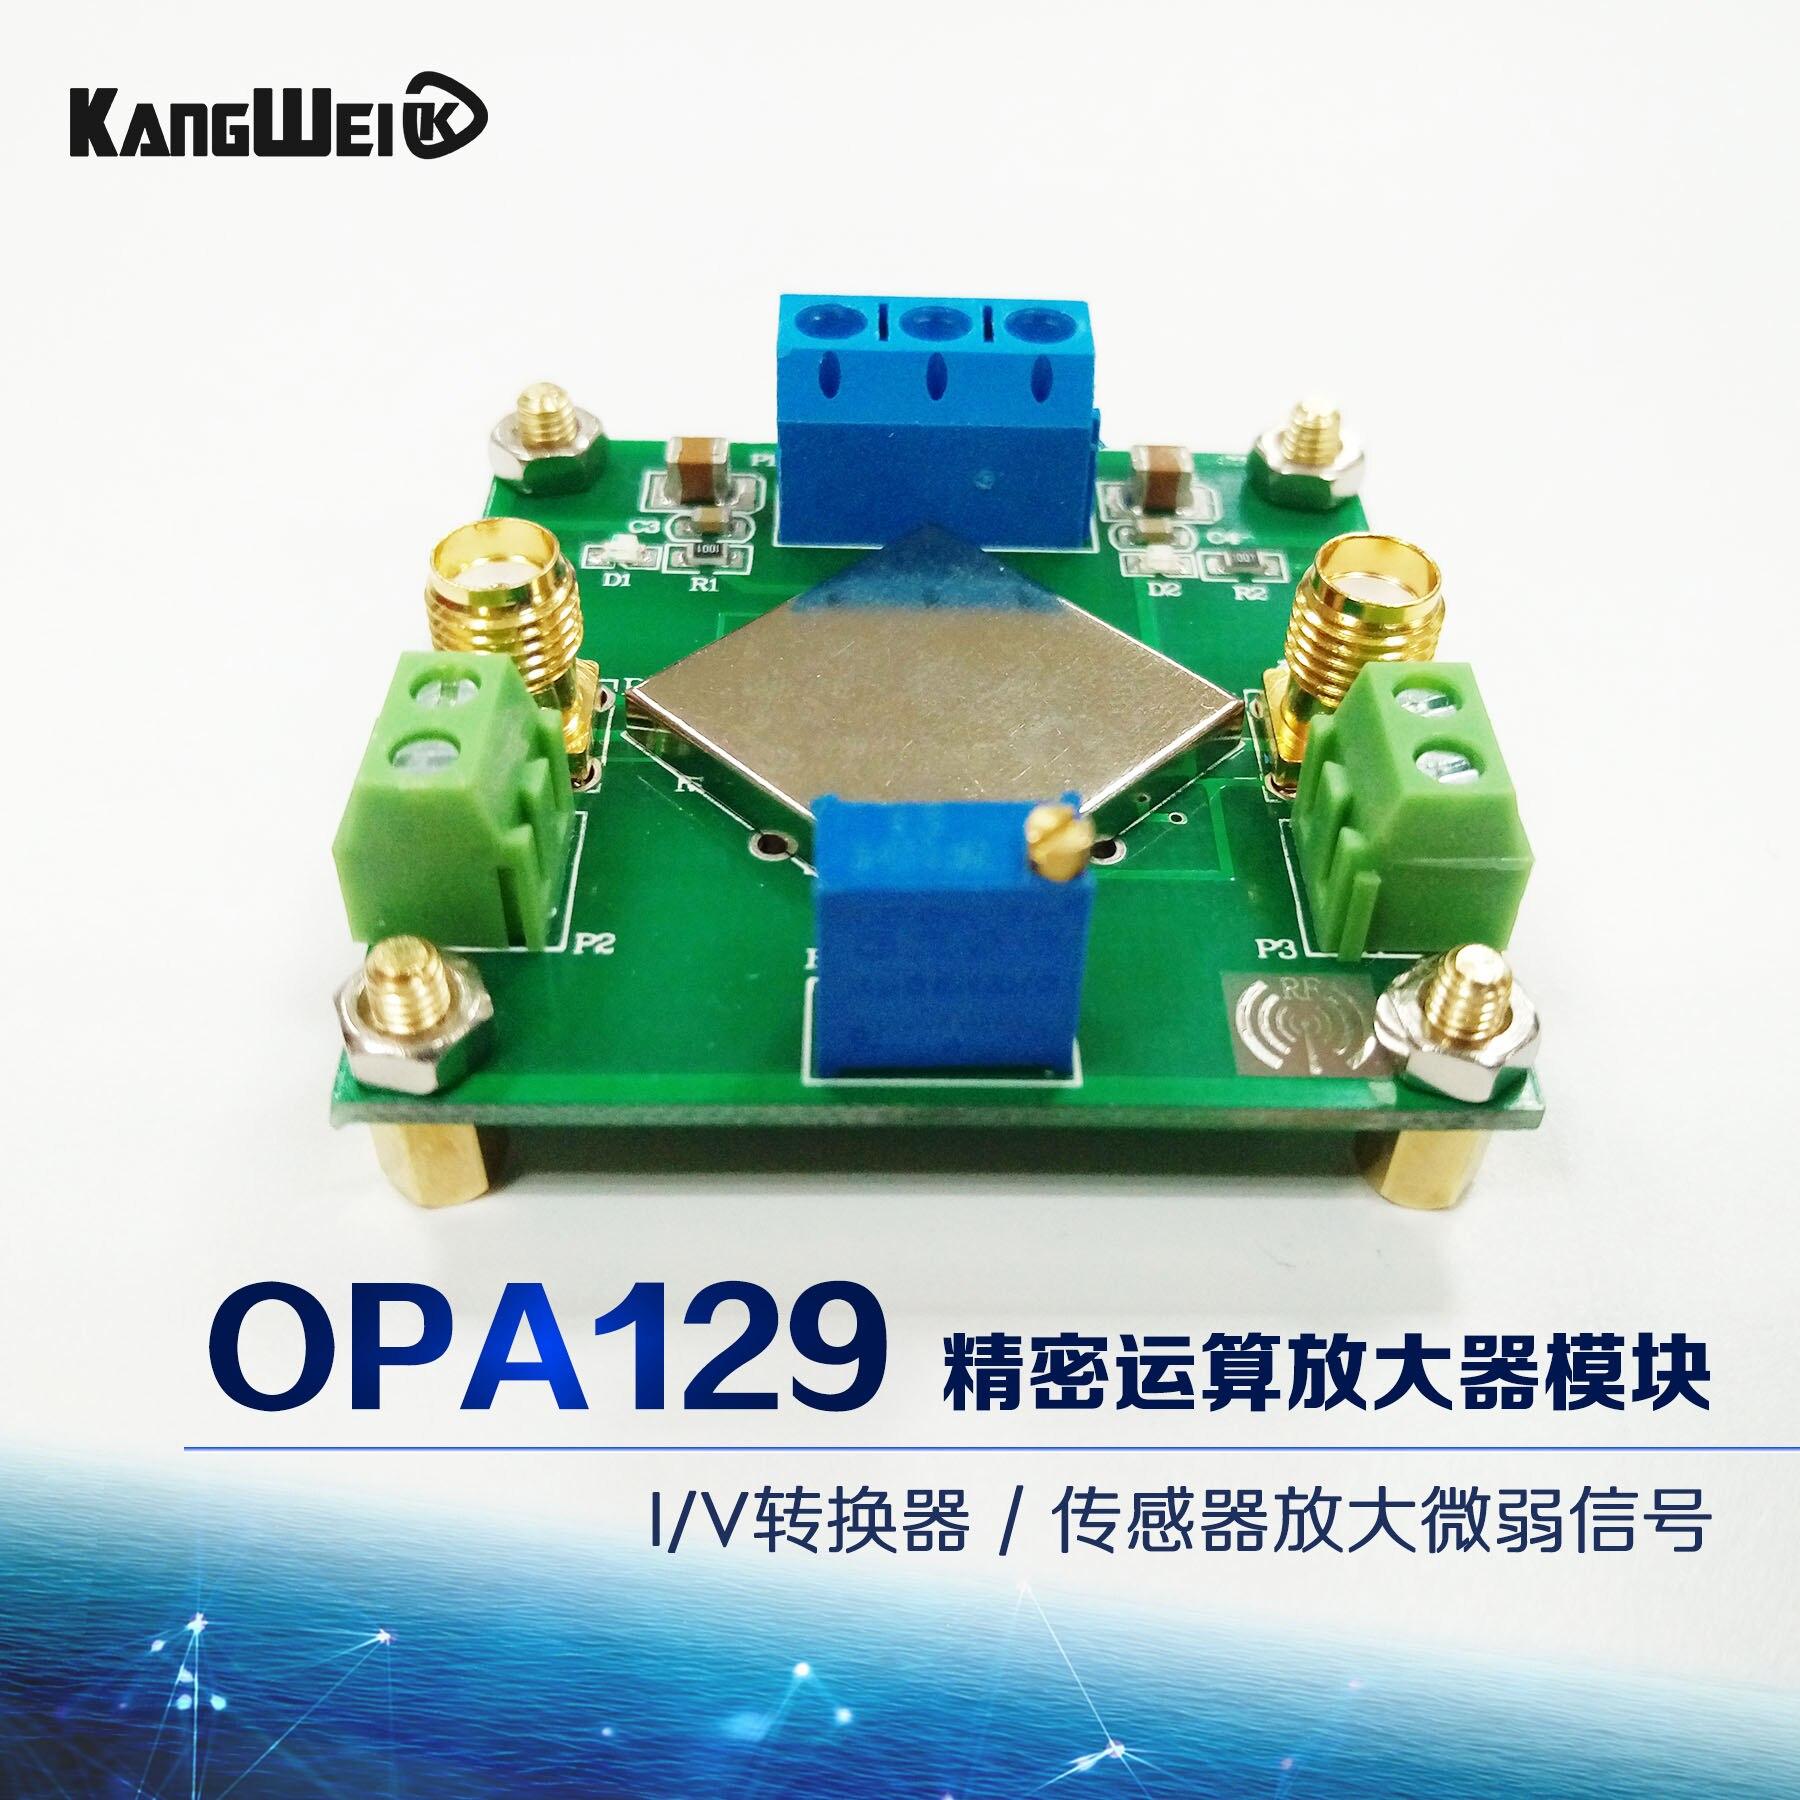 High impedance precision operational amplifier module OPA129 I/V converter sensor amplify weak signal<br>